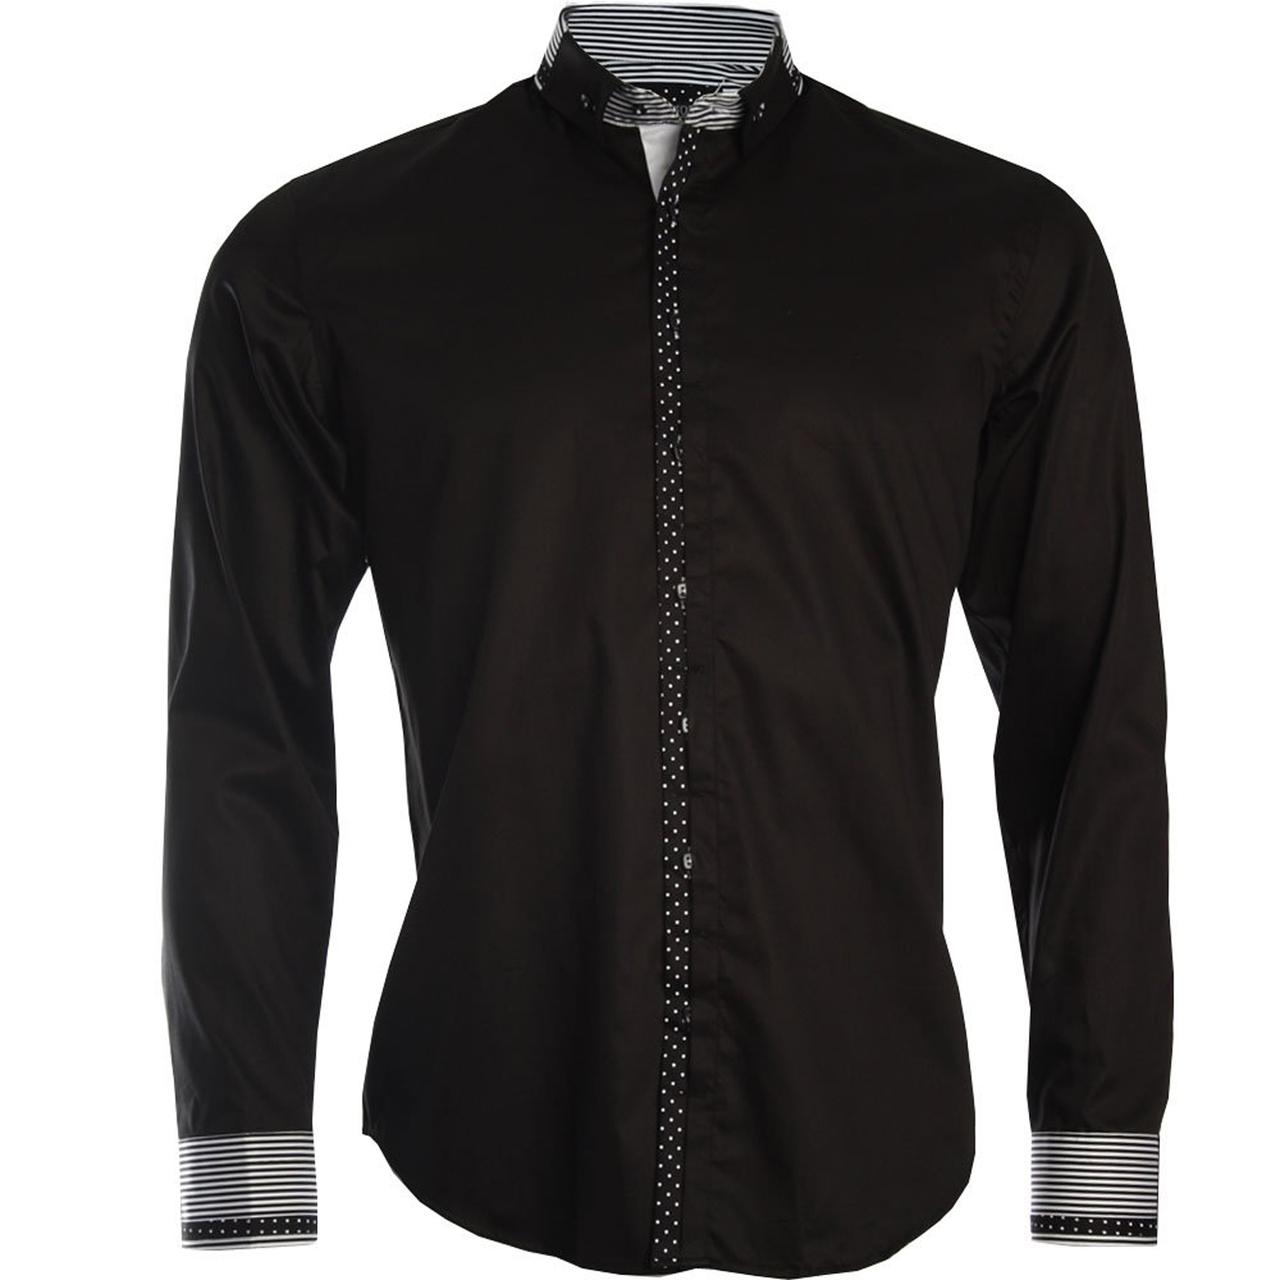 Men 39 s italian style black button down formal shirt for Tuxedo shirt black buttons